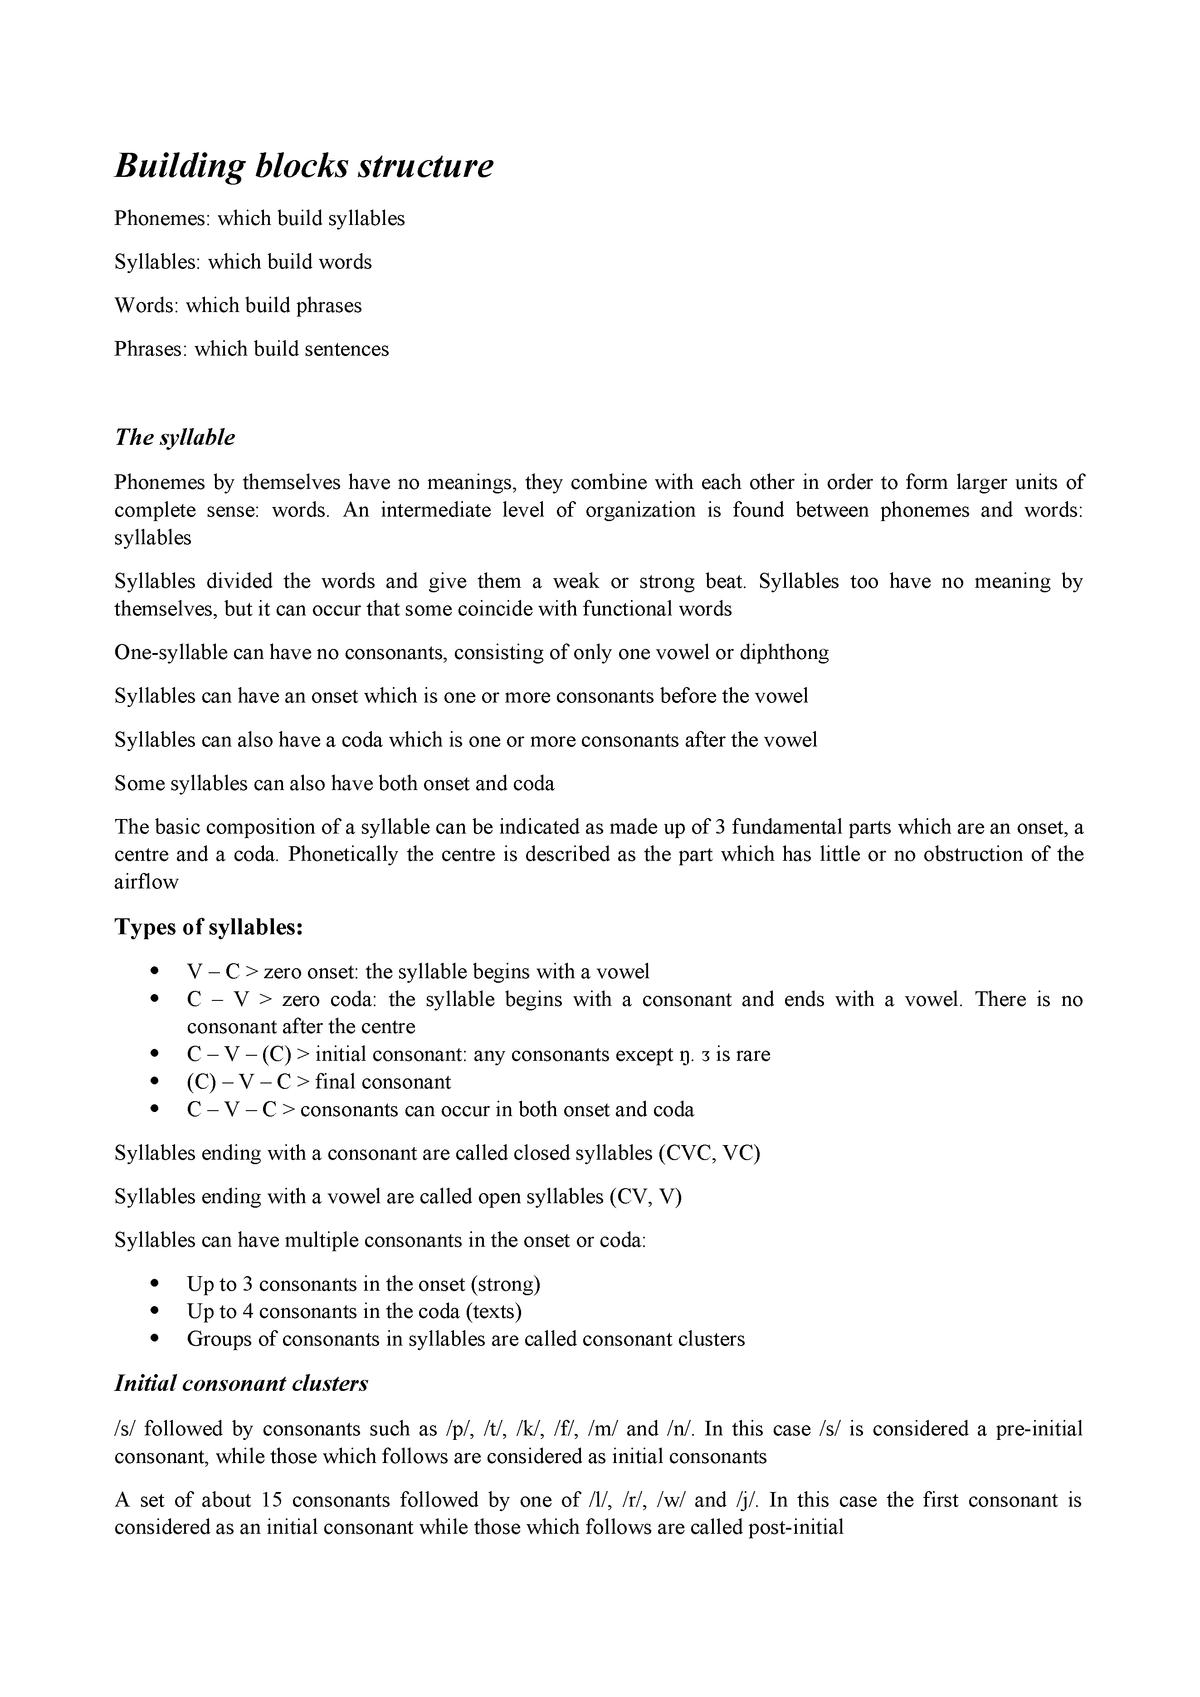 Building blocks structure - 4S002896: English language 1